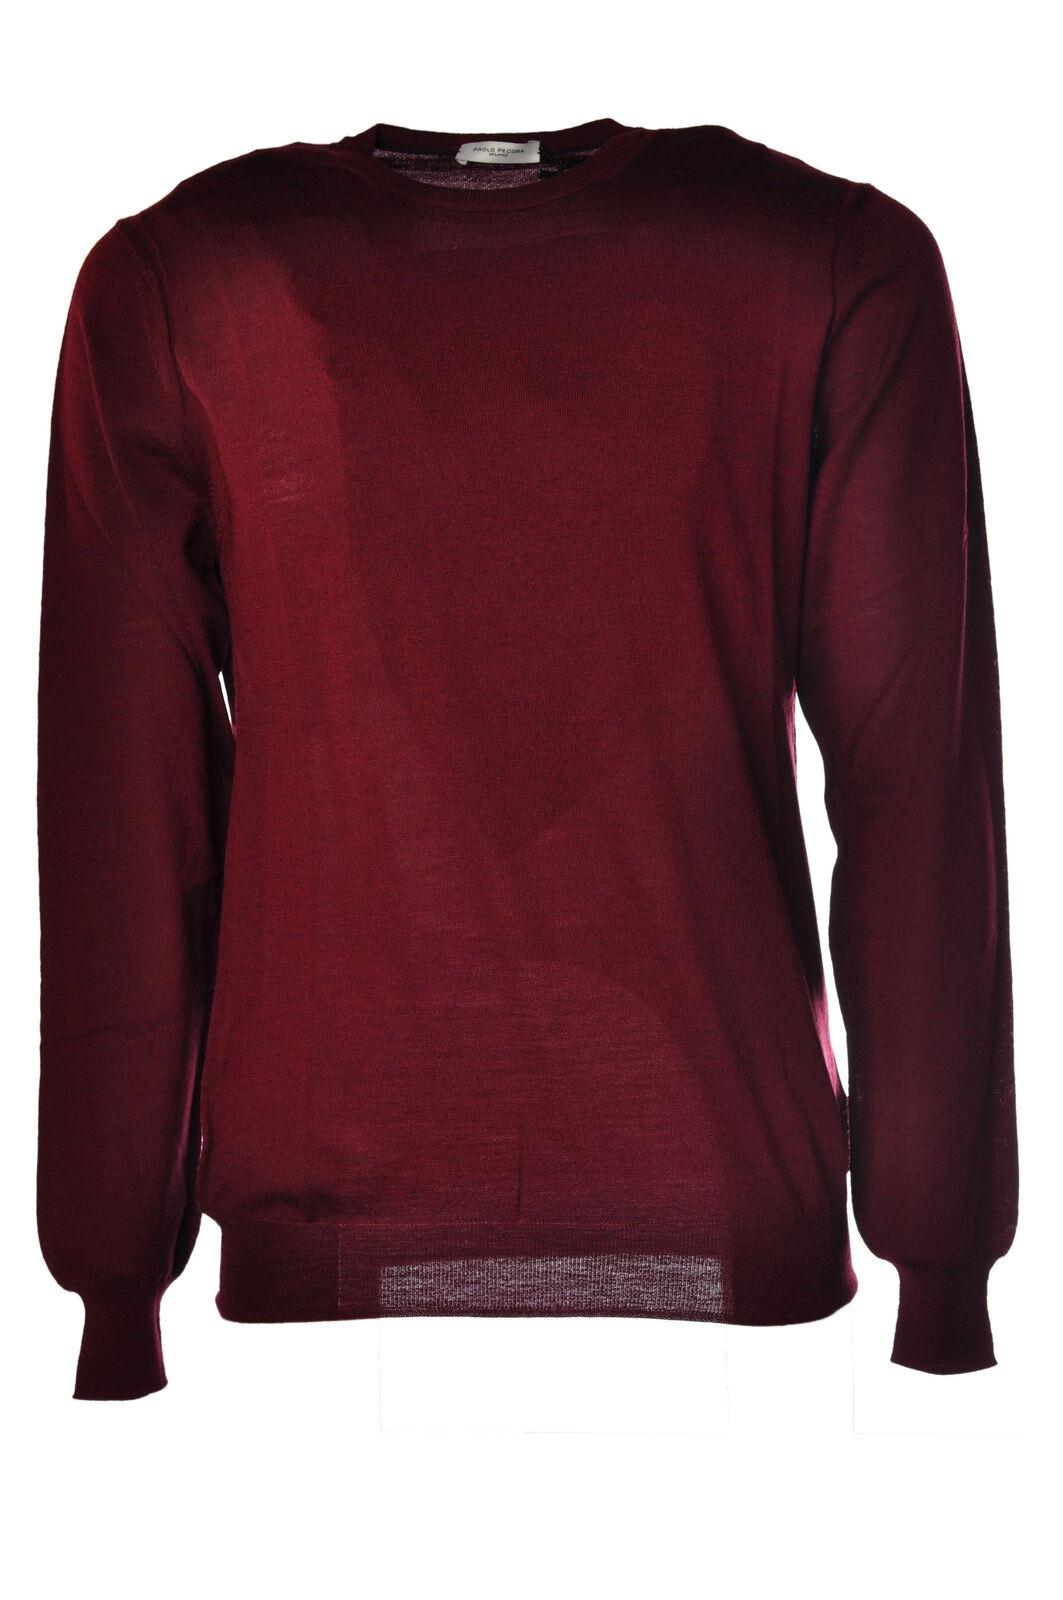 Paolo Pecora - Knitwear-Sweaters - Man - ROT - 586315C183702